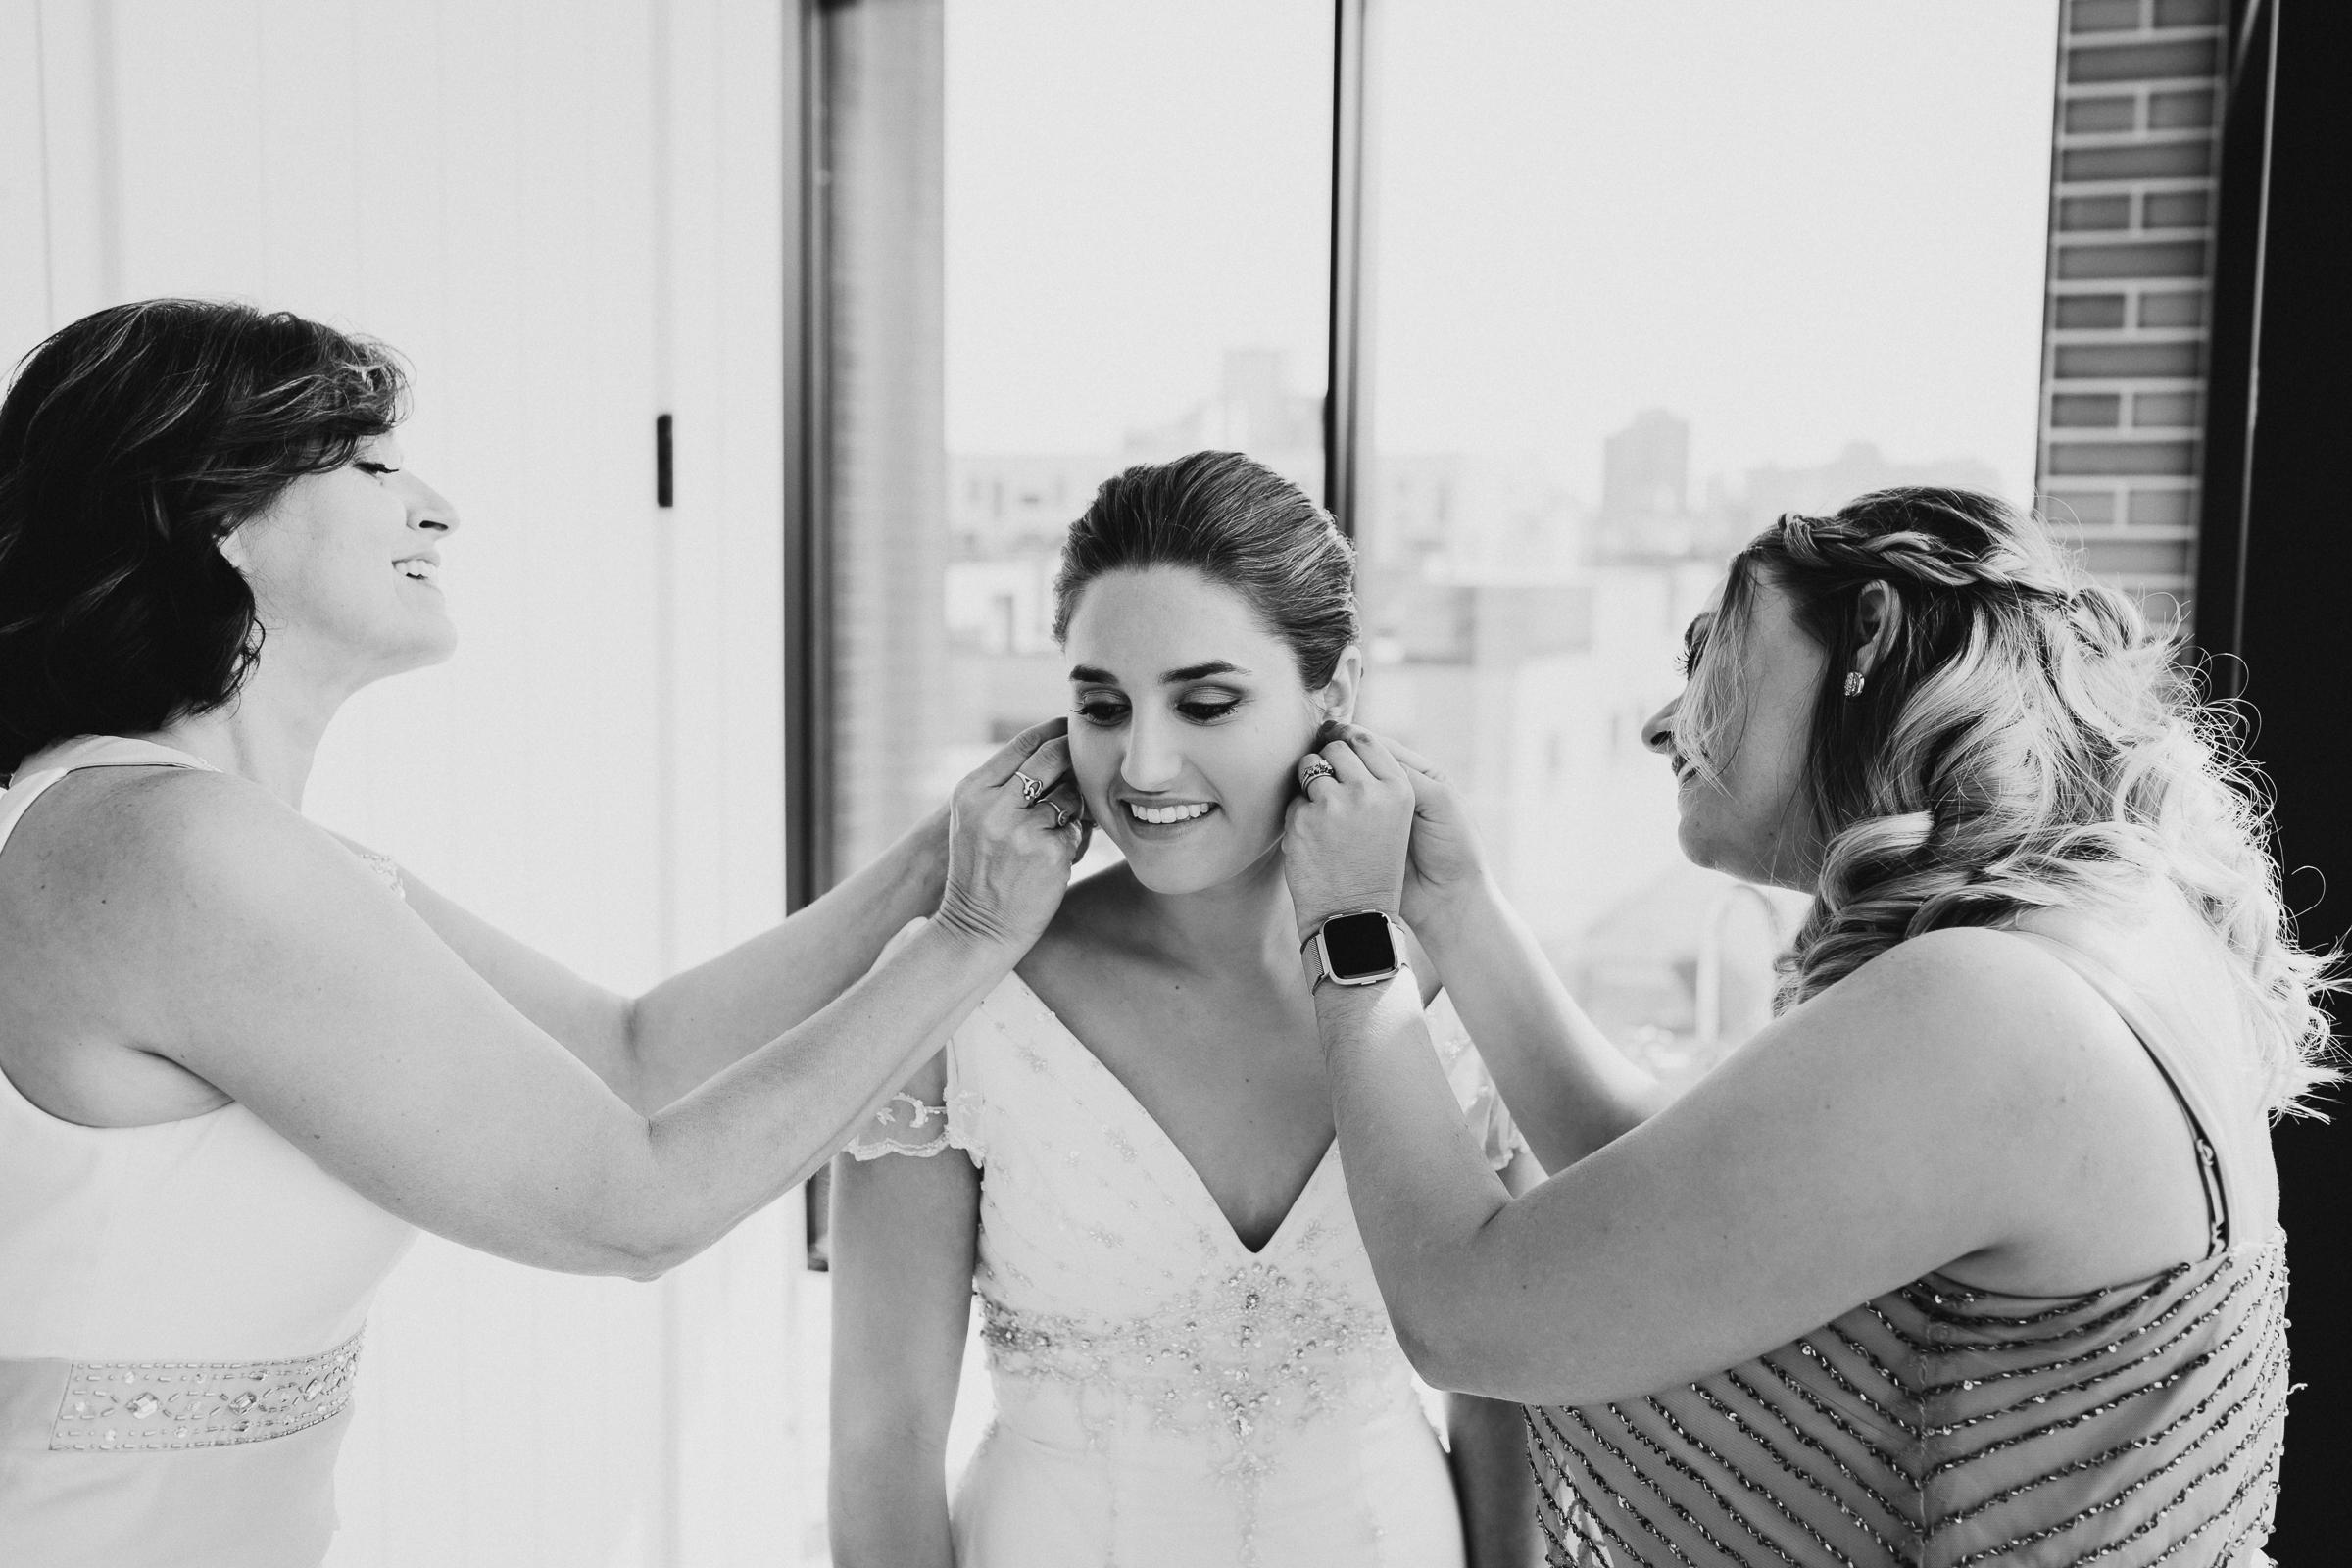 Brooklyn-Winery-NYC-Editorial-Documentary-Wedding-Photographer-Gina-Oli-12.jpg